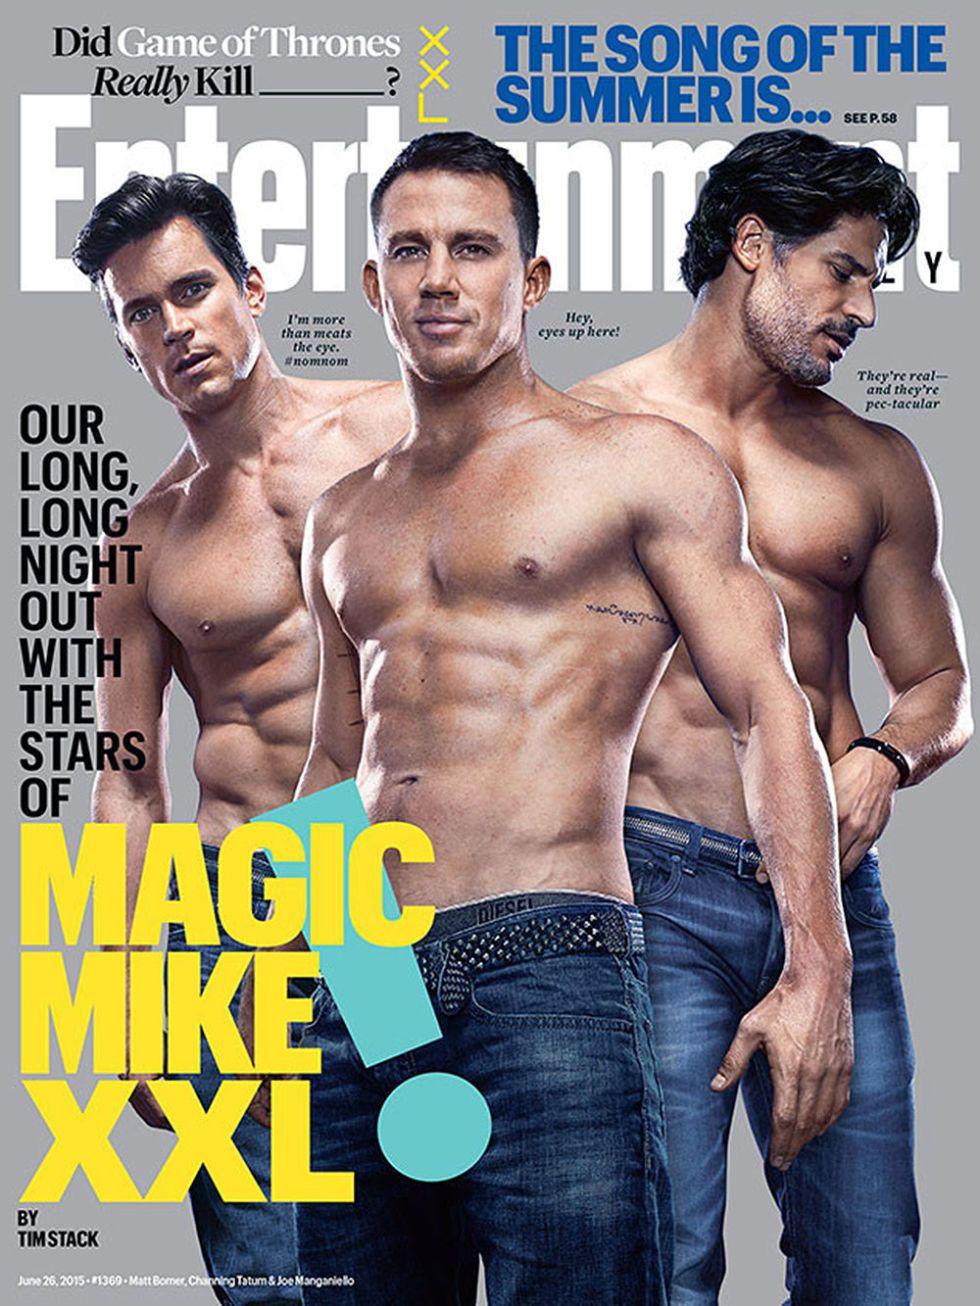 Magic mike xxl giveaways